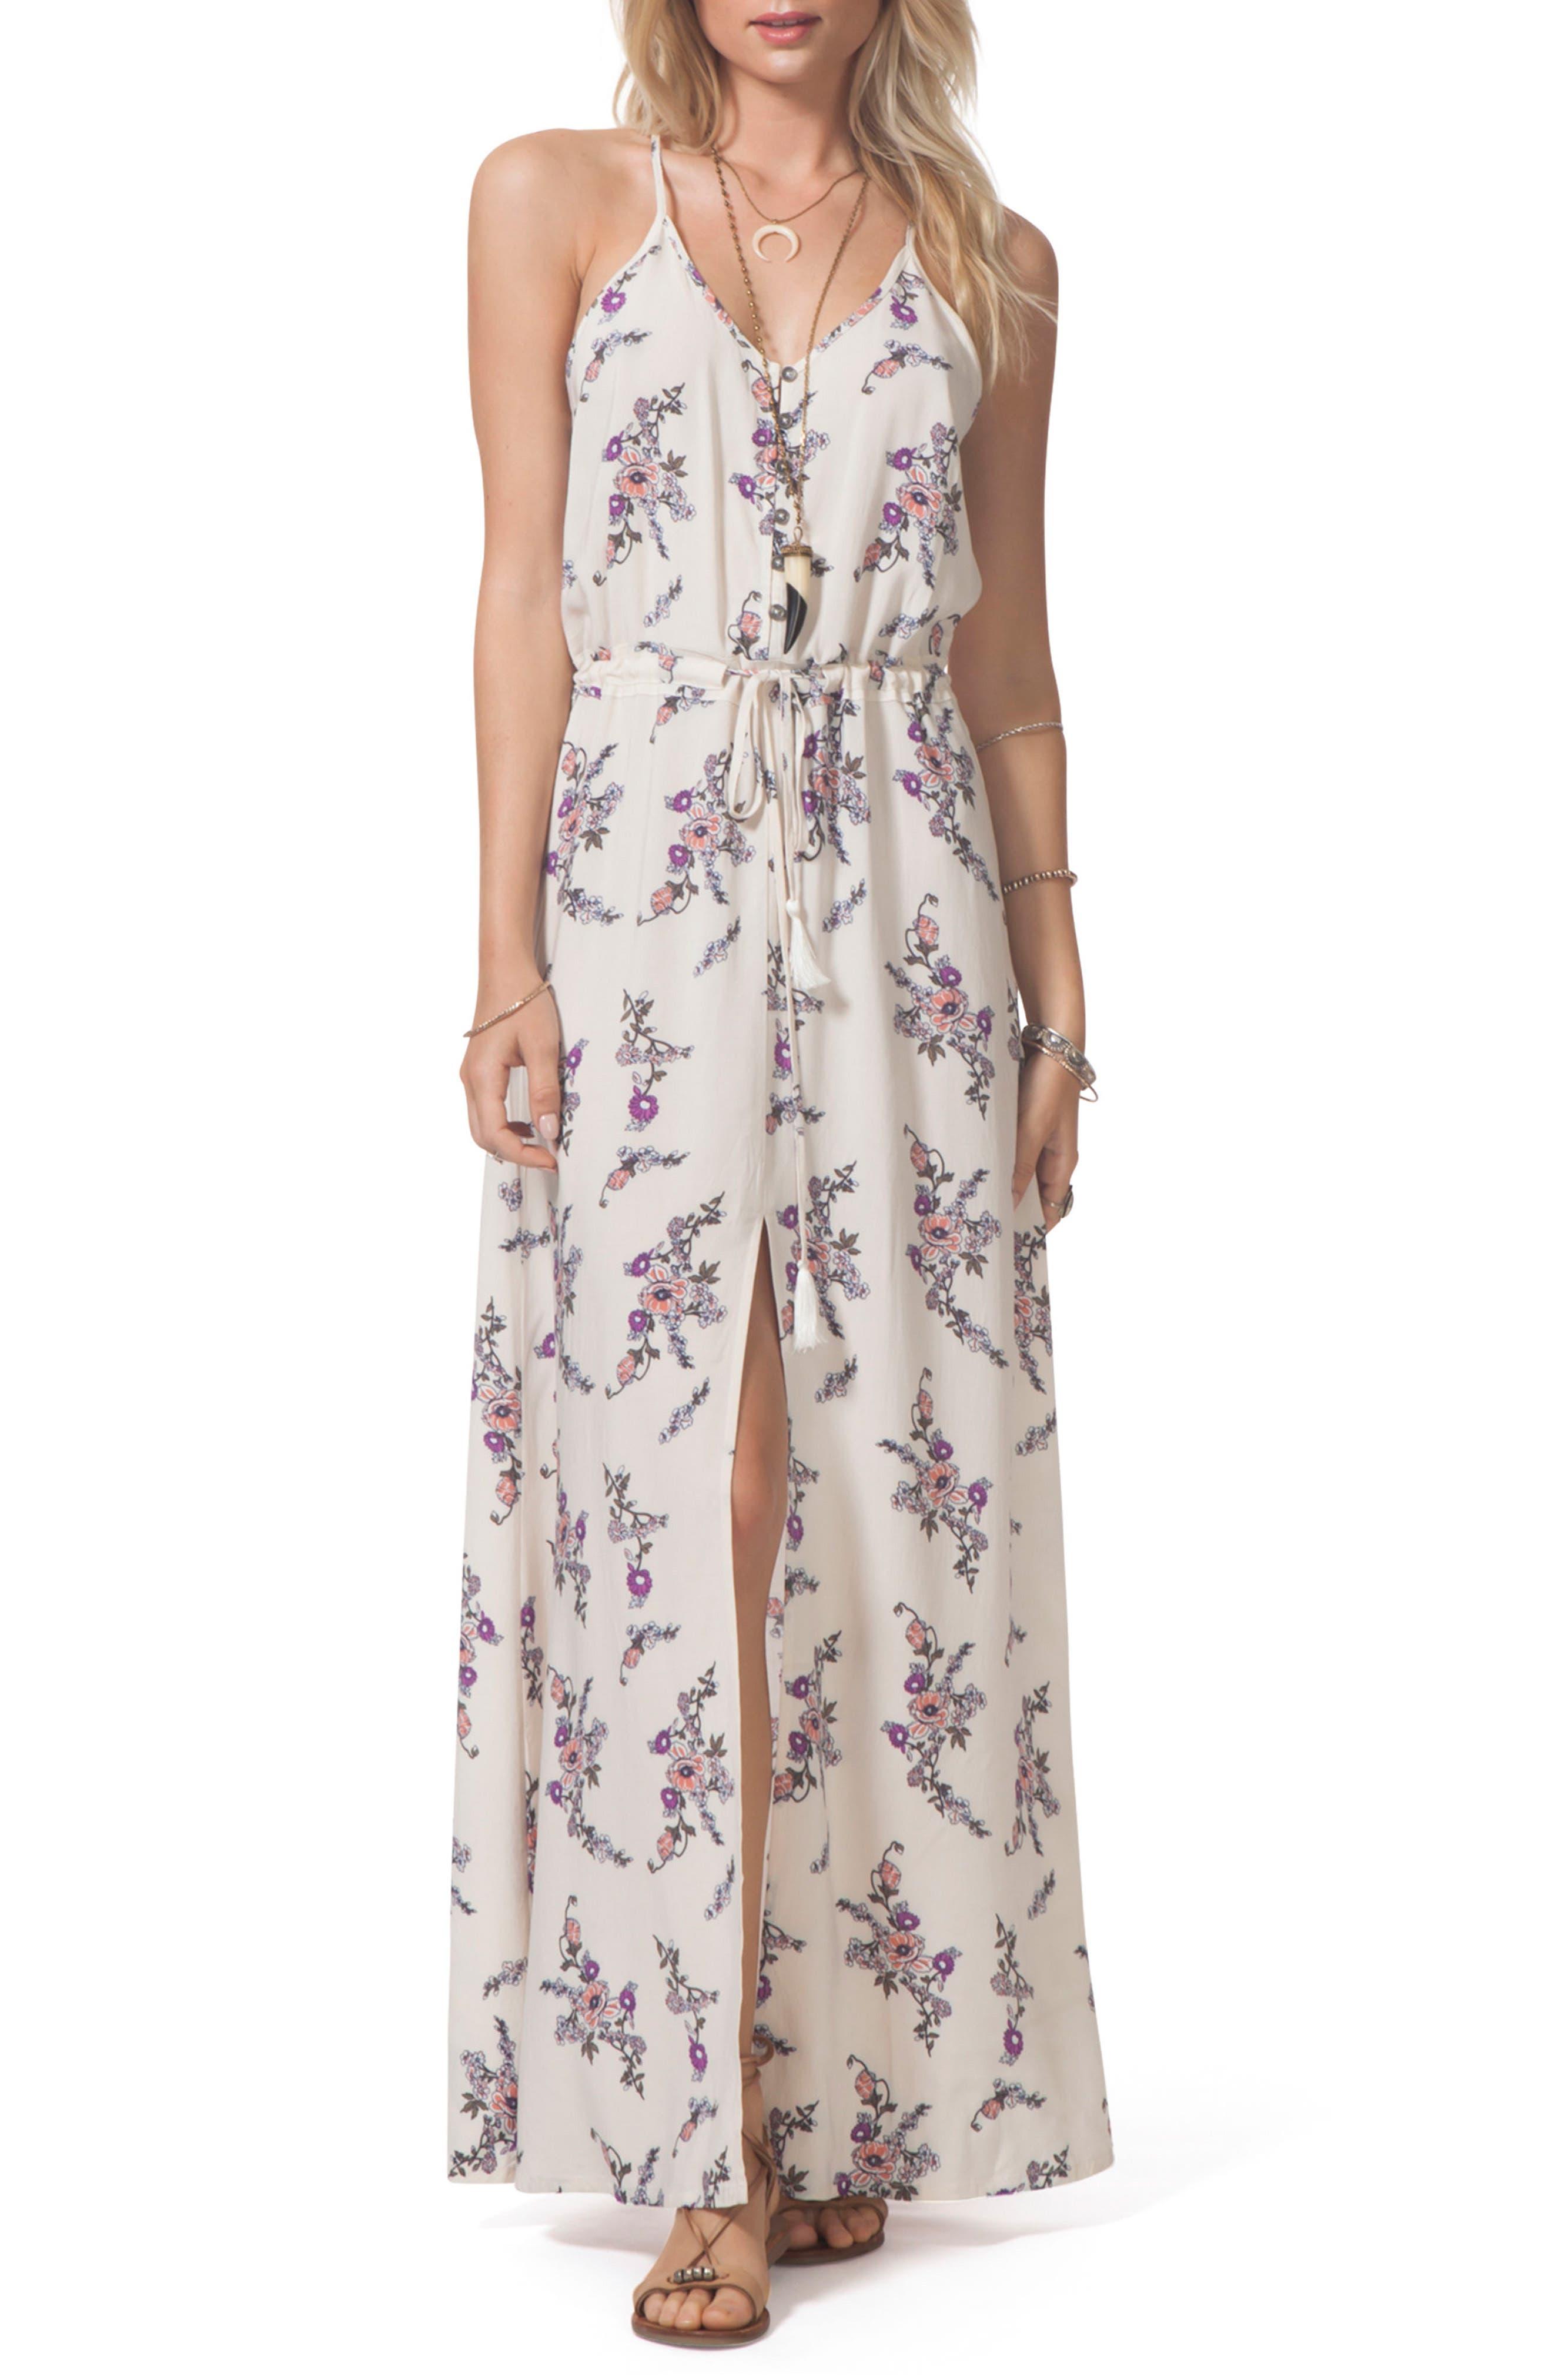 Rip Curl Malia Floral Print Maxi Dress, White